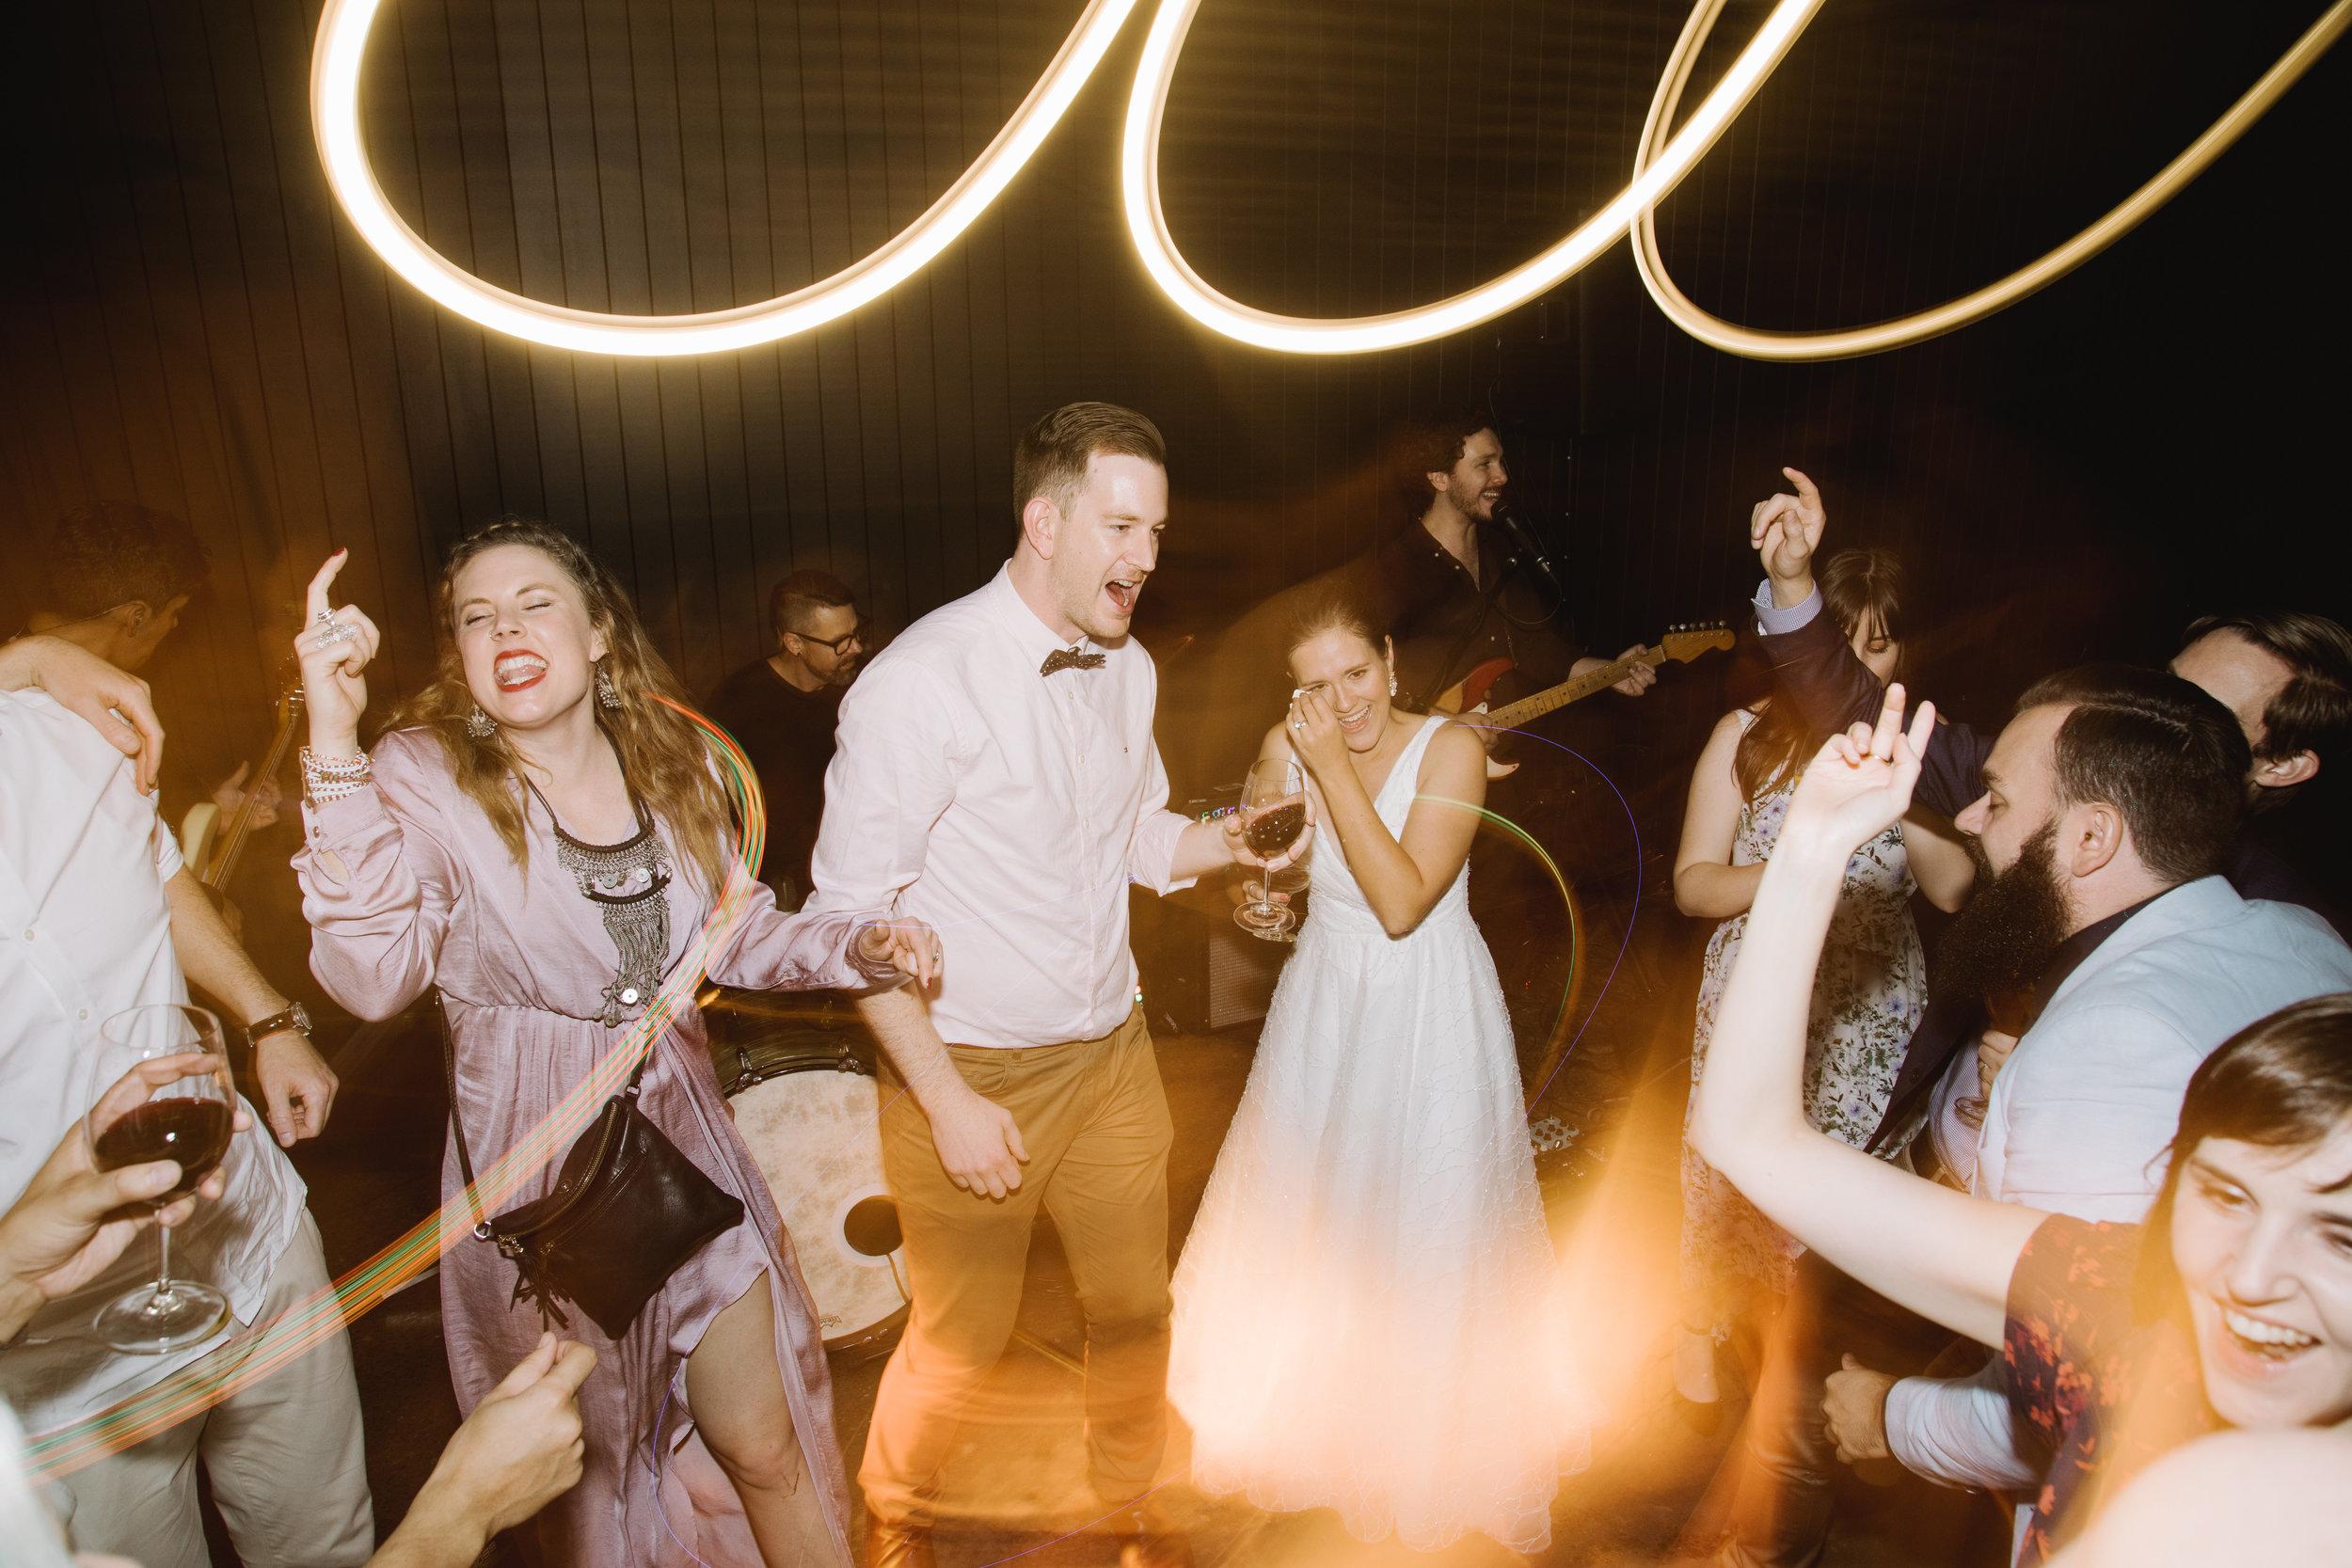 refinery-brisbane-wedding-reception-25.jpg